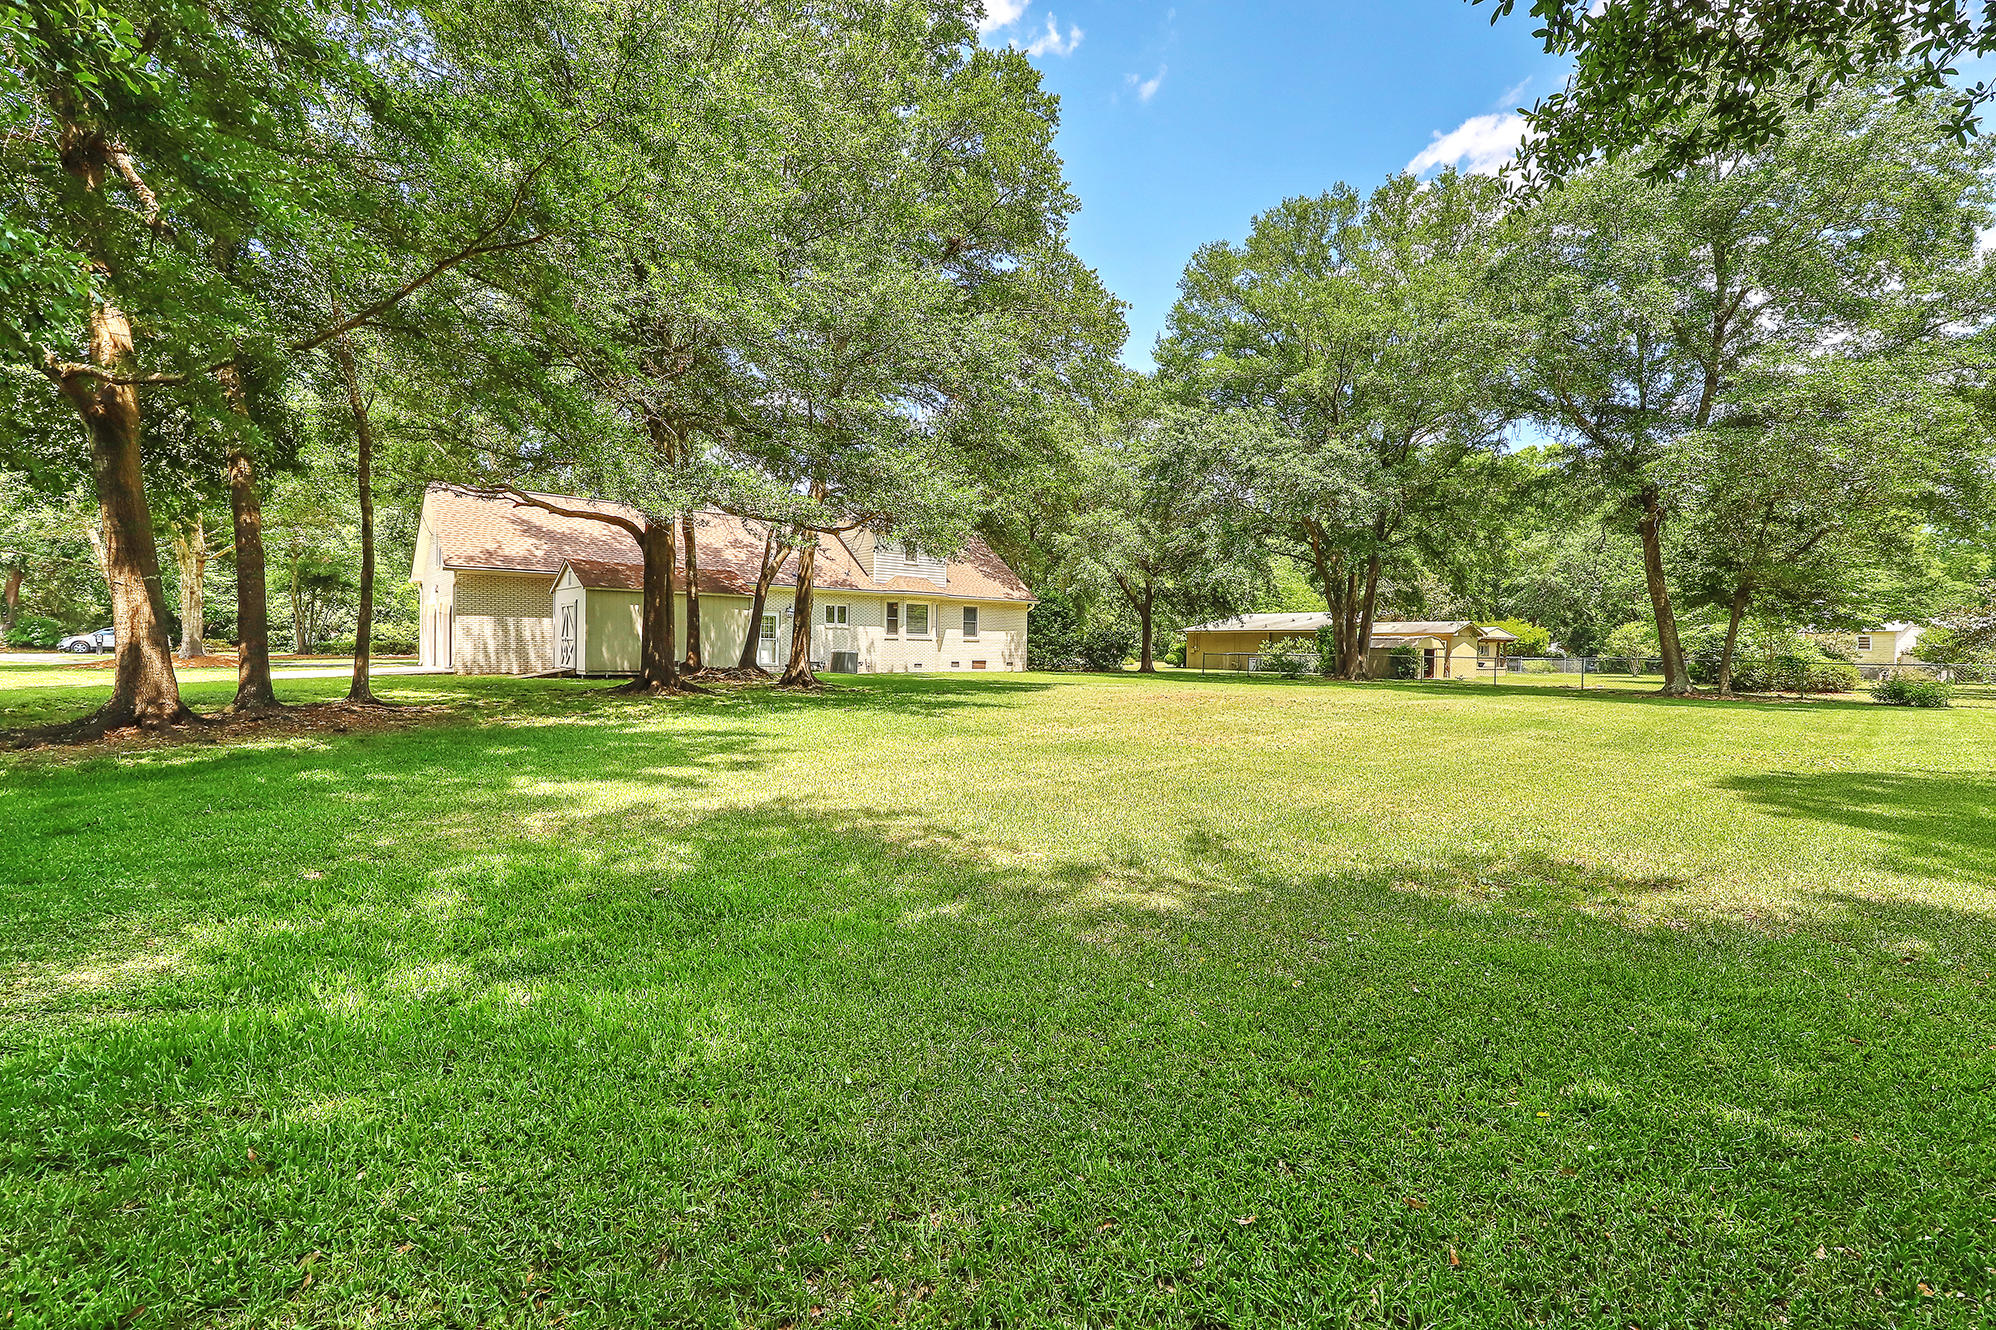 Edgewater Park Homes For Sale - 1413 Edsent, Charleston, SC - 14